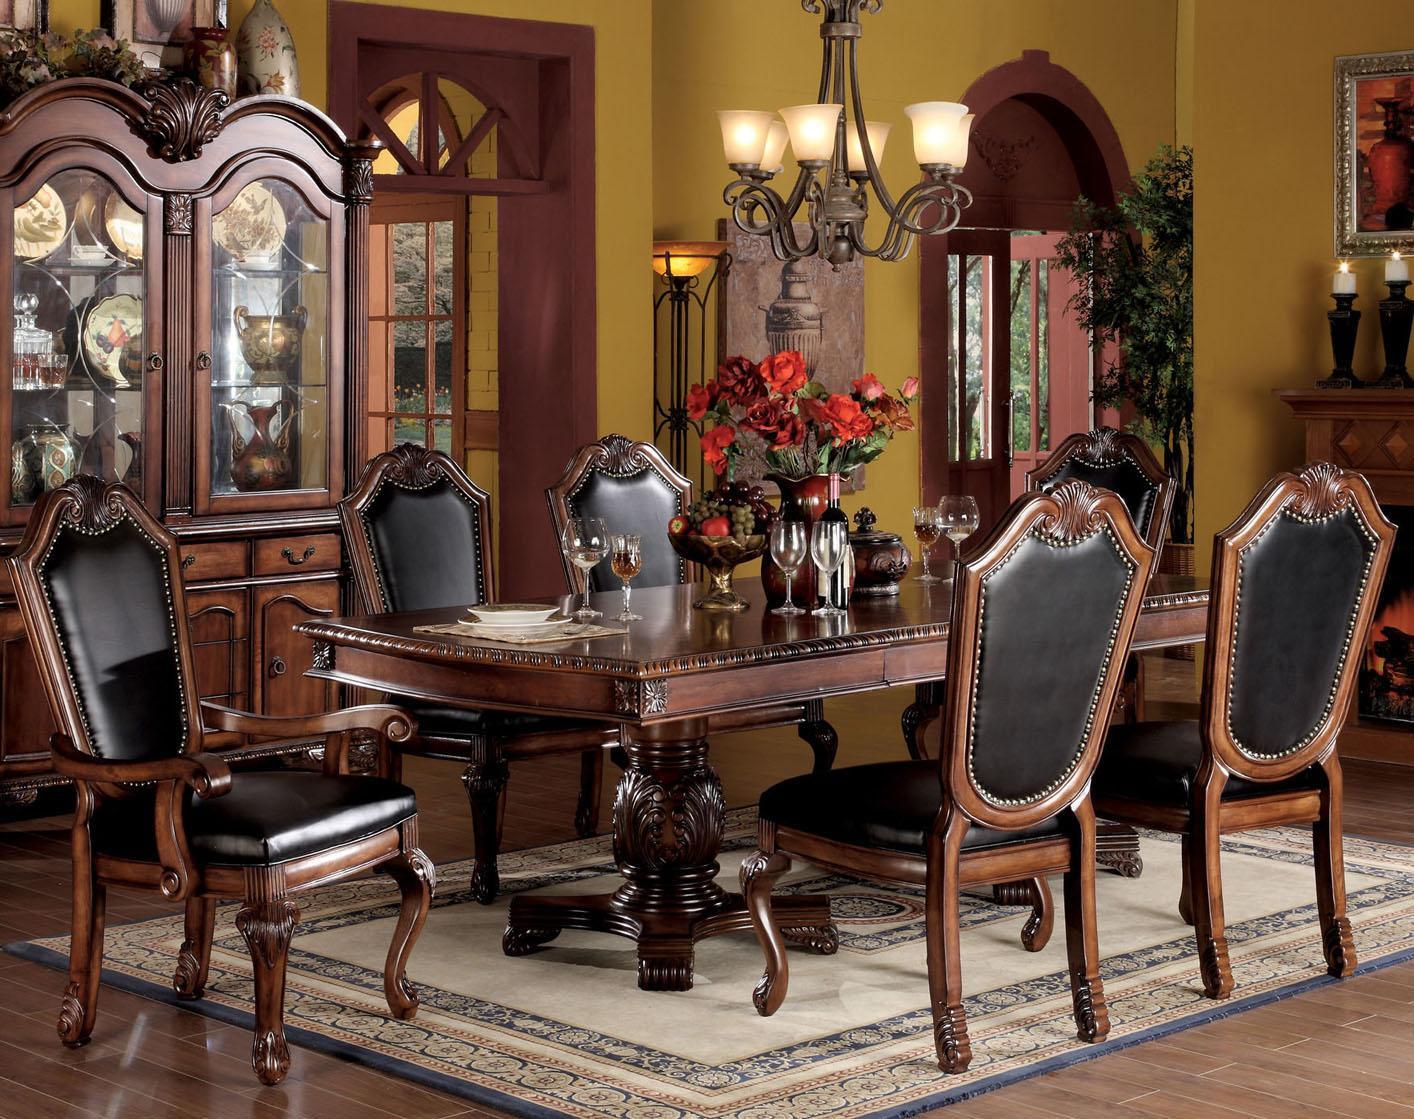 Acme furniture chateau de ville 7 piece formal dining set for Leather dining room sets